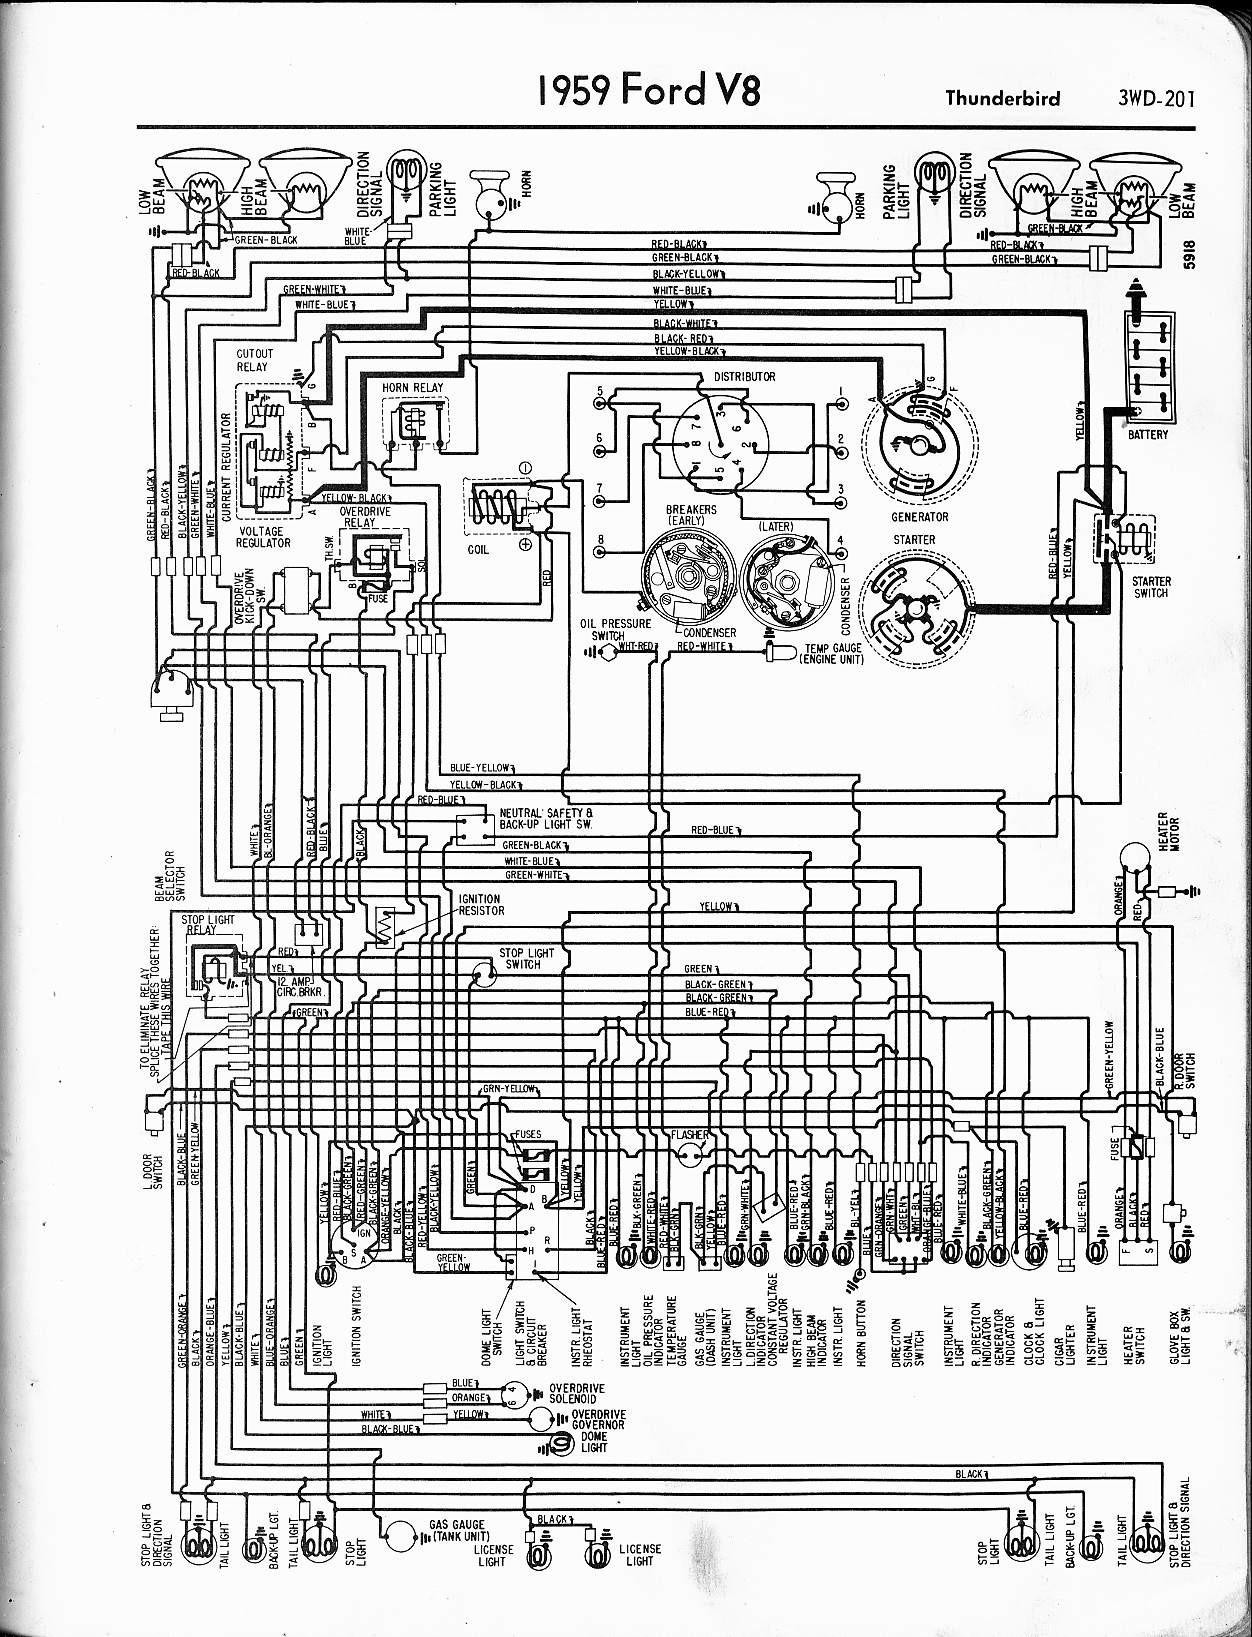 69 Torino Wiring Diagram 2003 Honda Civic Ex Fuel Filter Location Hondaa Accordd Periihh1 Jeanjaures37 Fr